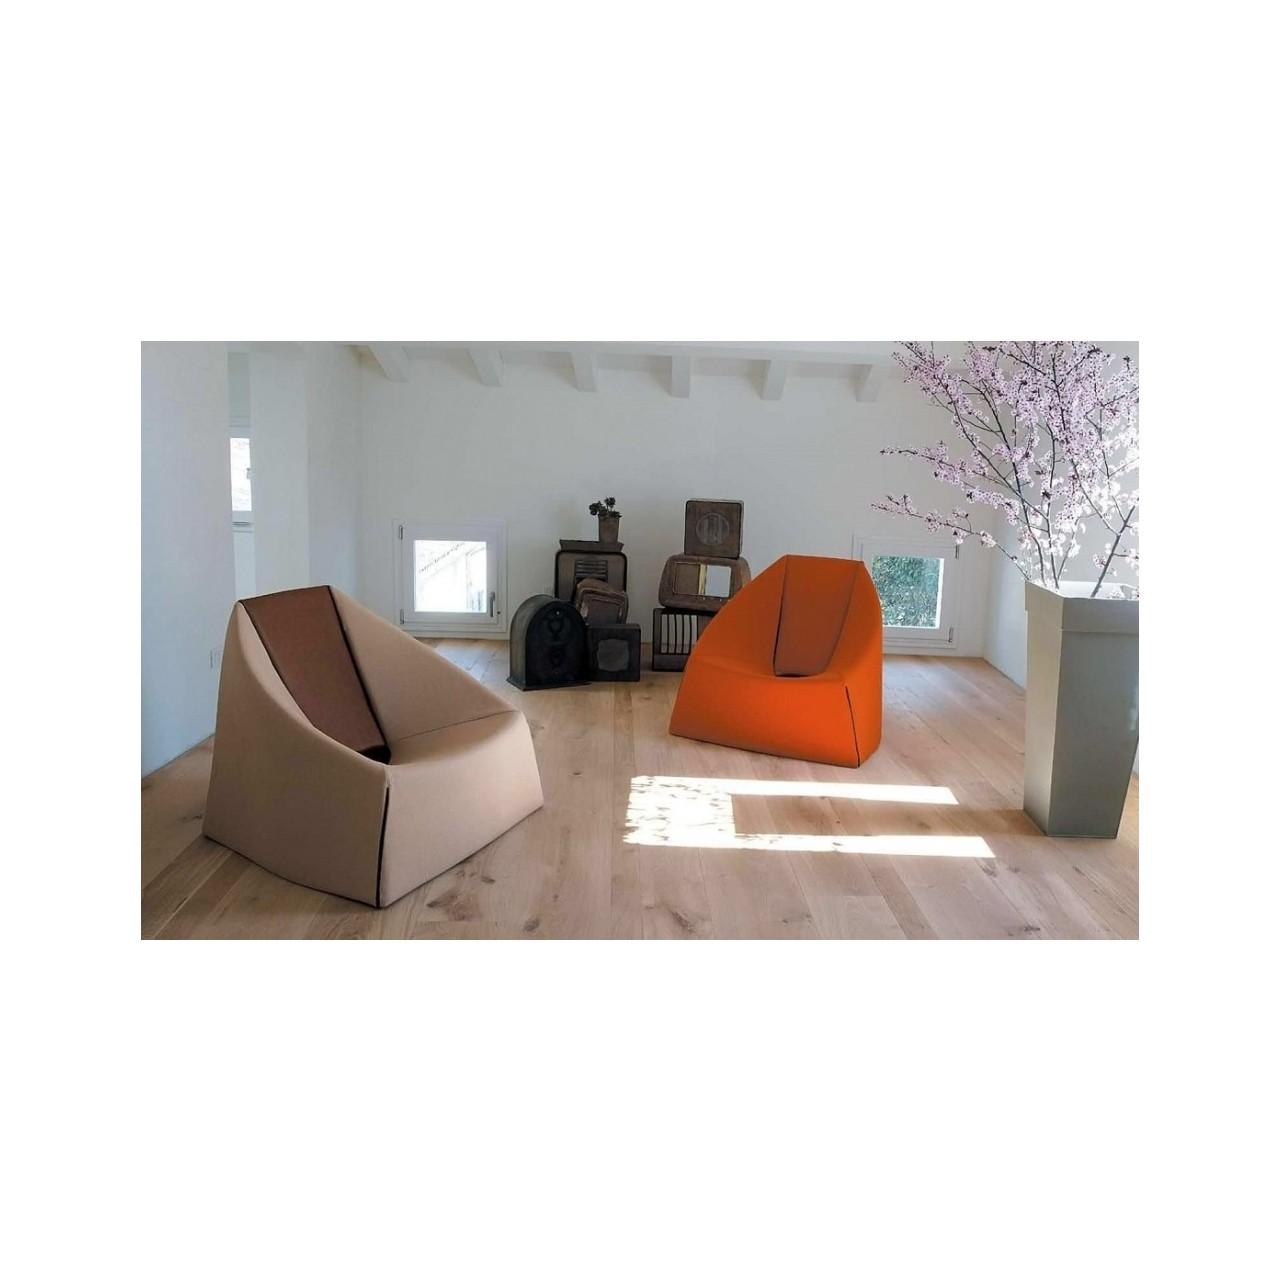 products ubu furniture. Ubu; Ubu Products Furniture H